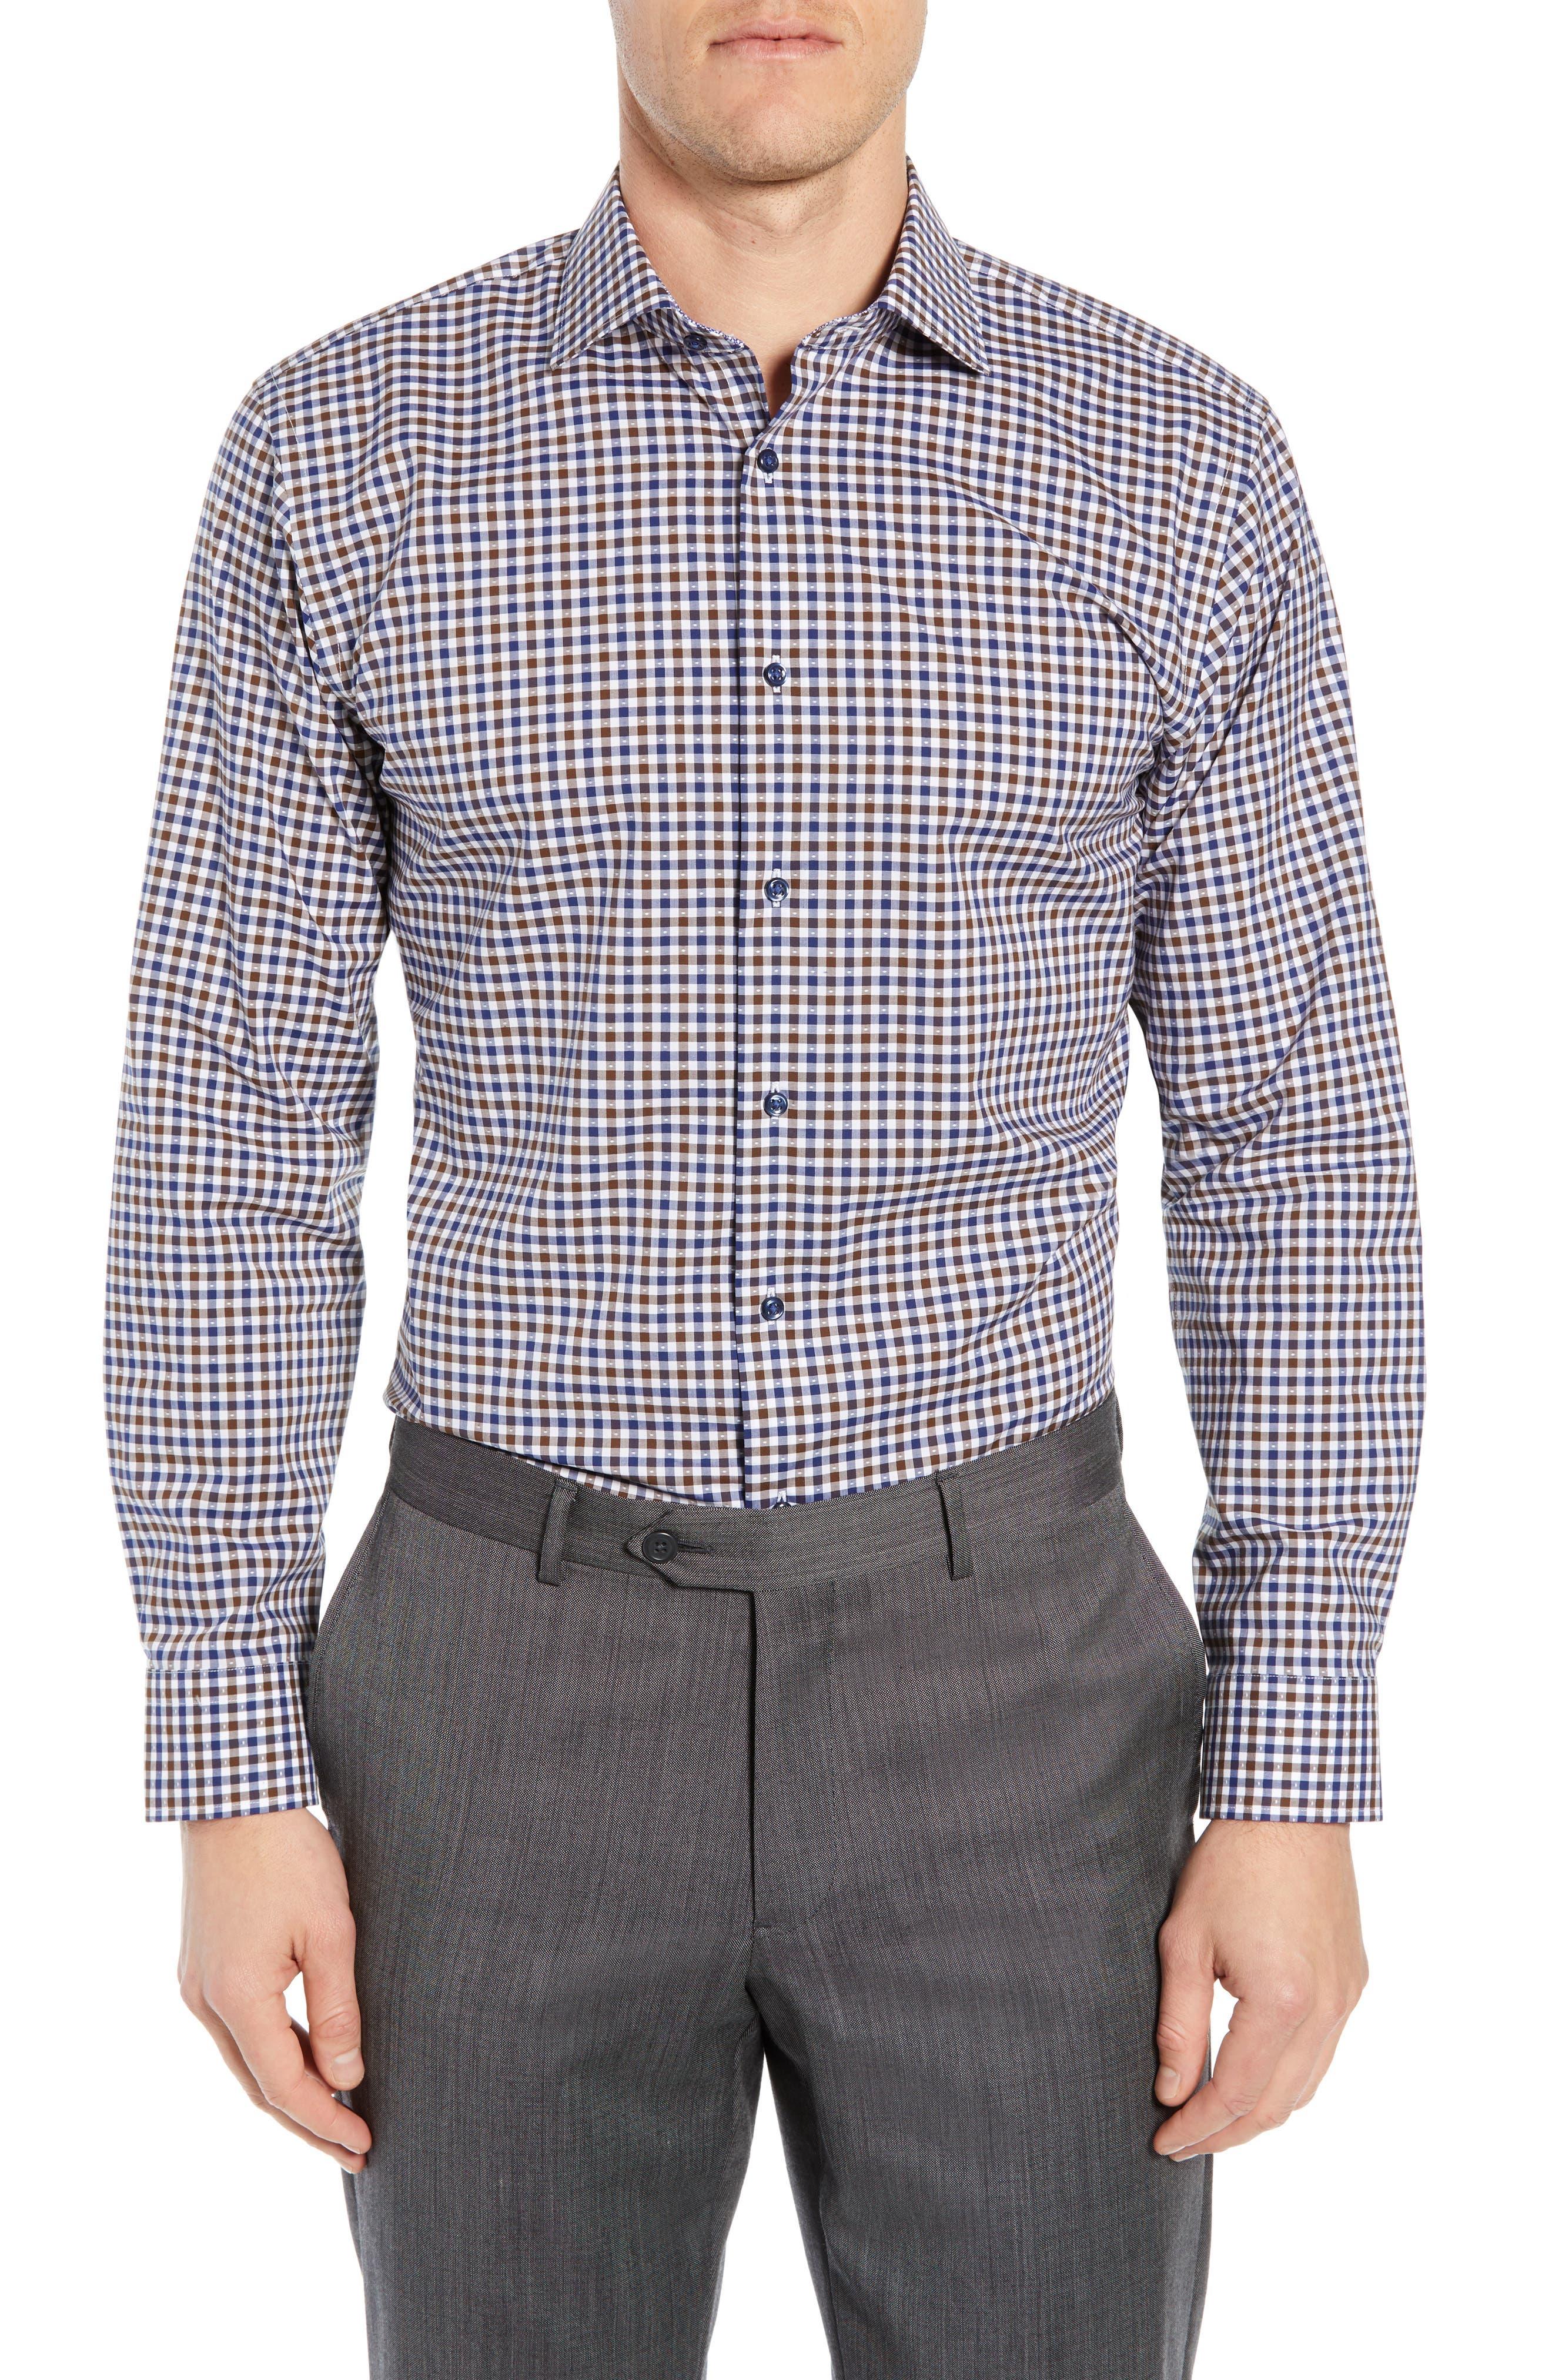 NORDSTROM MEN'S SHOP Trim Fit Non-Iron Check Dress Shirt, Main, color, BROWN FAWN